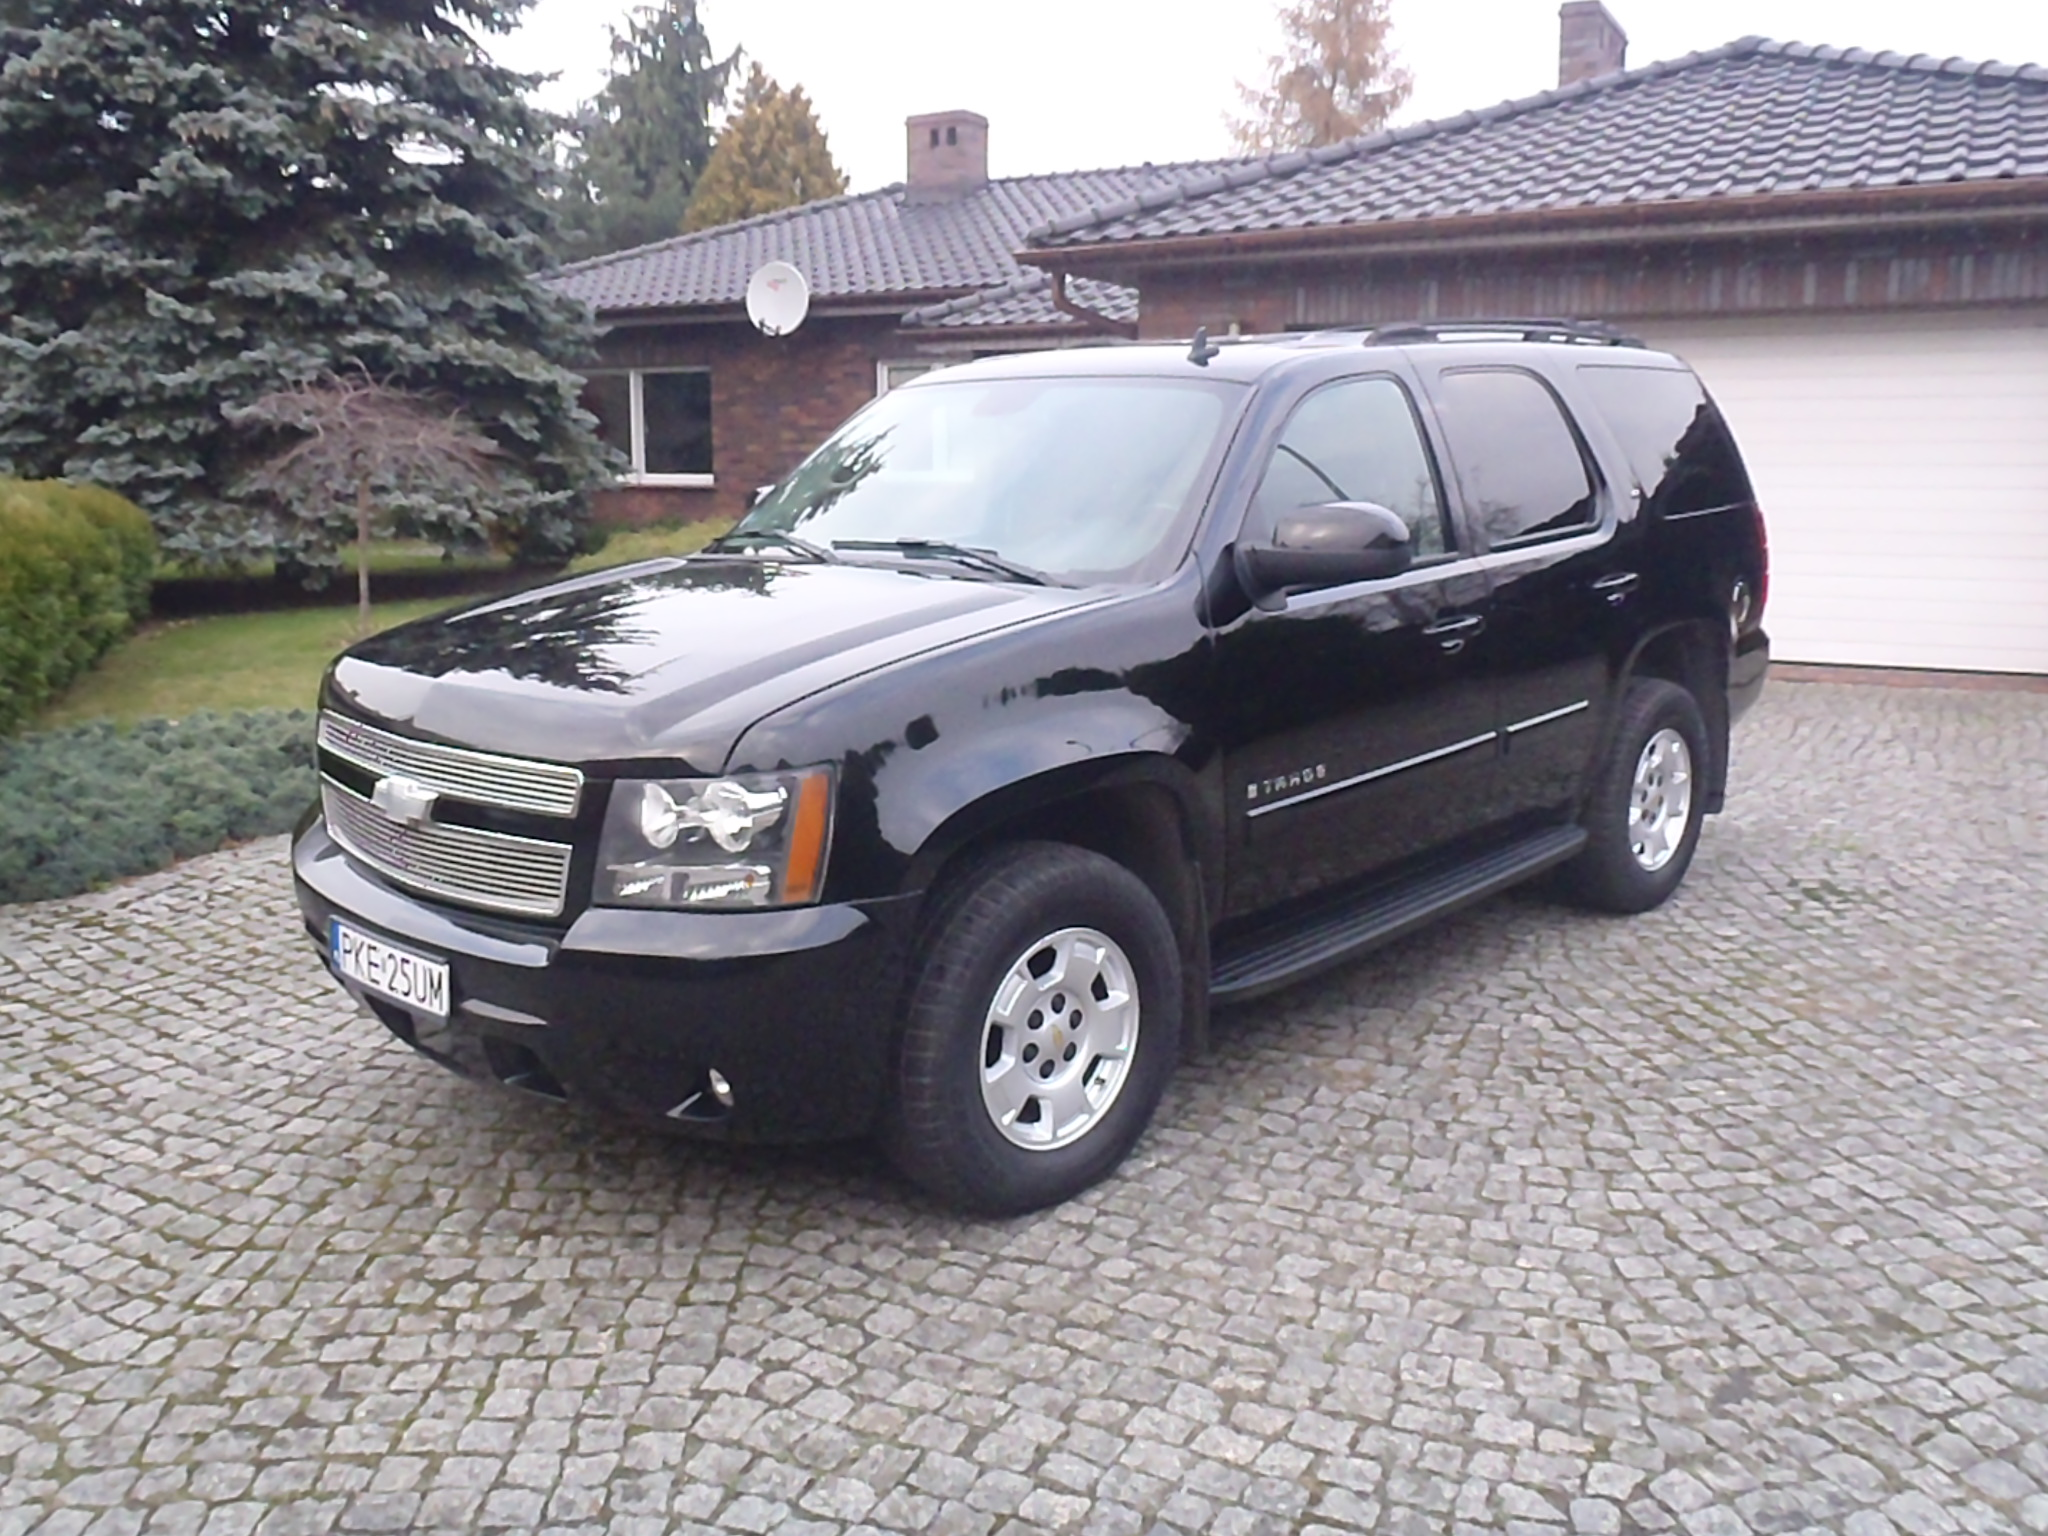 Chevrolet Tahoe Lt 2007 5 3 L V8 4x4 325km 7051586861 Oficjalne Archiwum Allegro